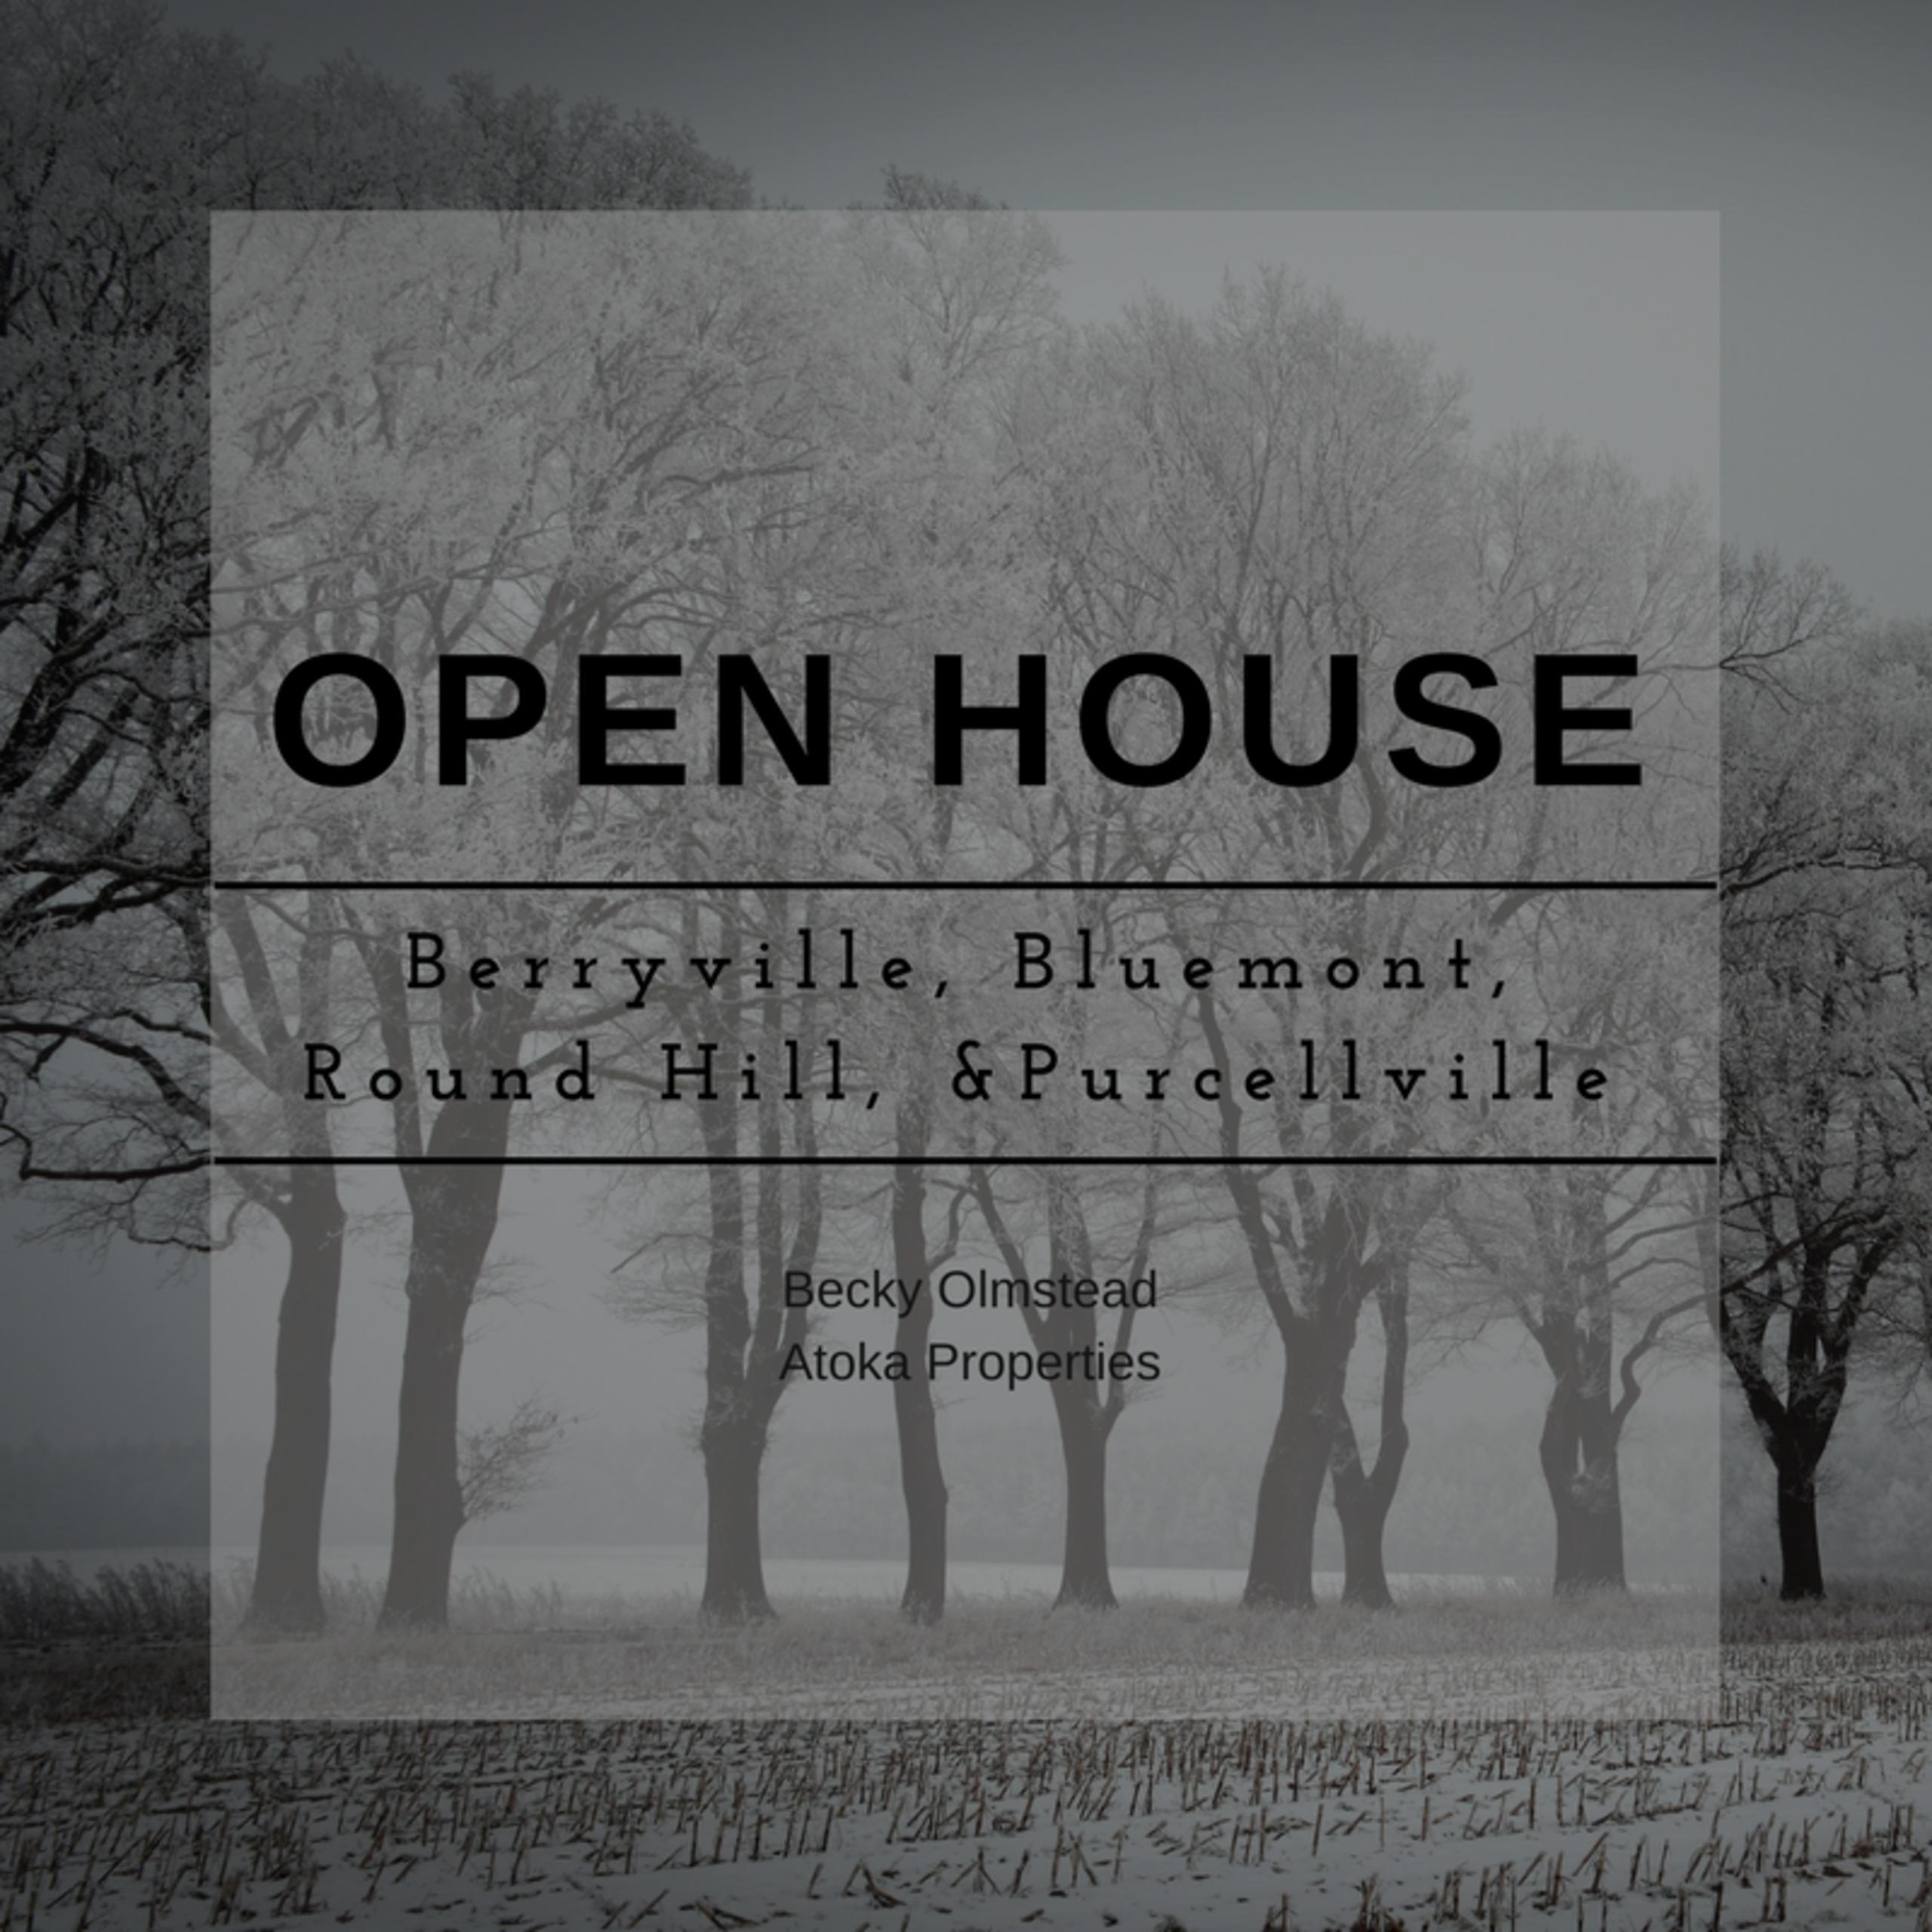 OPEN HOUSE LIST 01/13/18 – 01/14/18